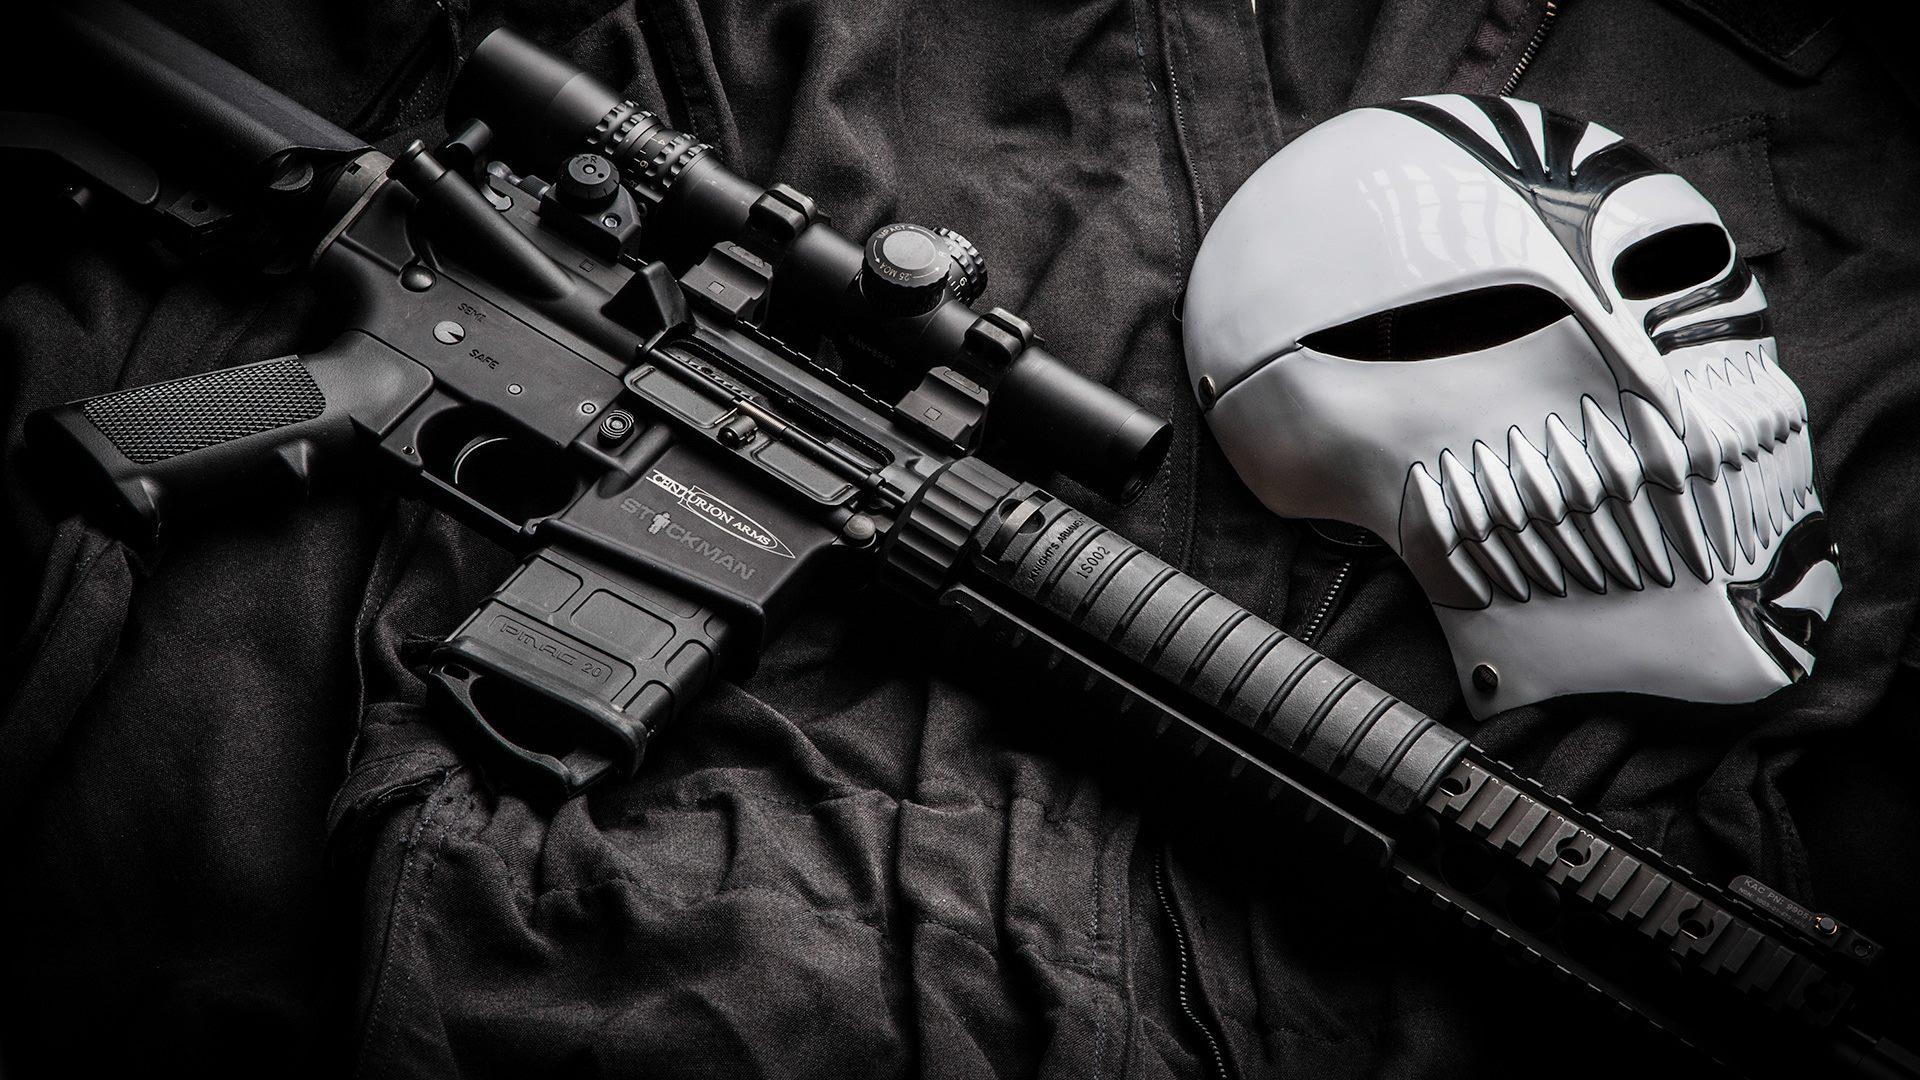 Gun Wallpaper Hd 256625 1920x1080